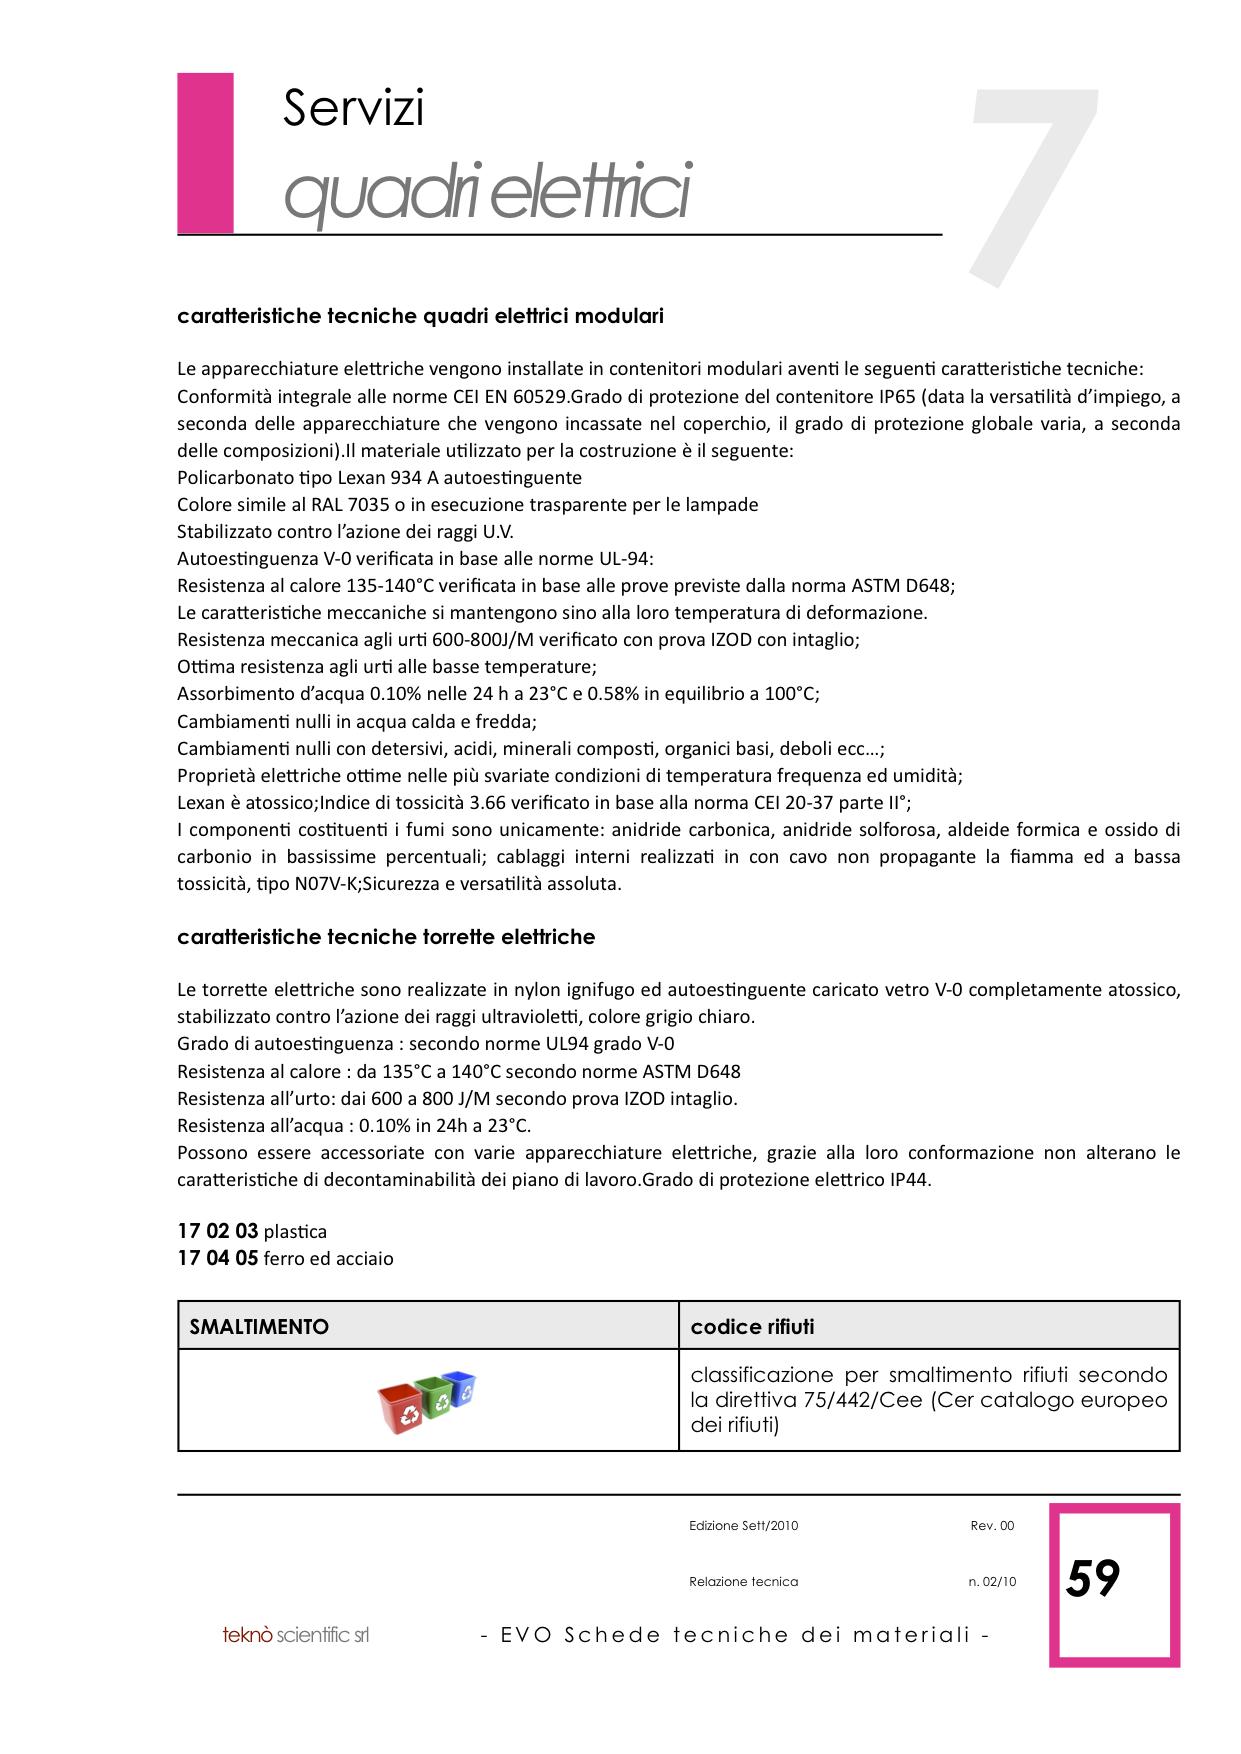 EVO Schede Tecniche materiali copia 20.png